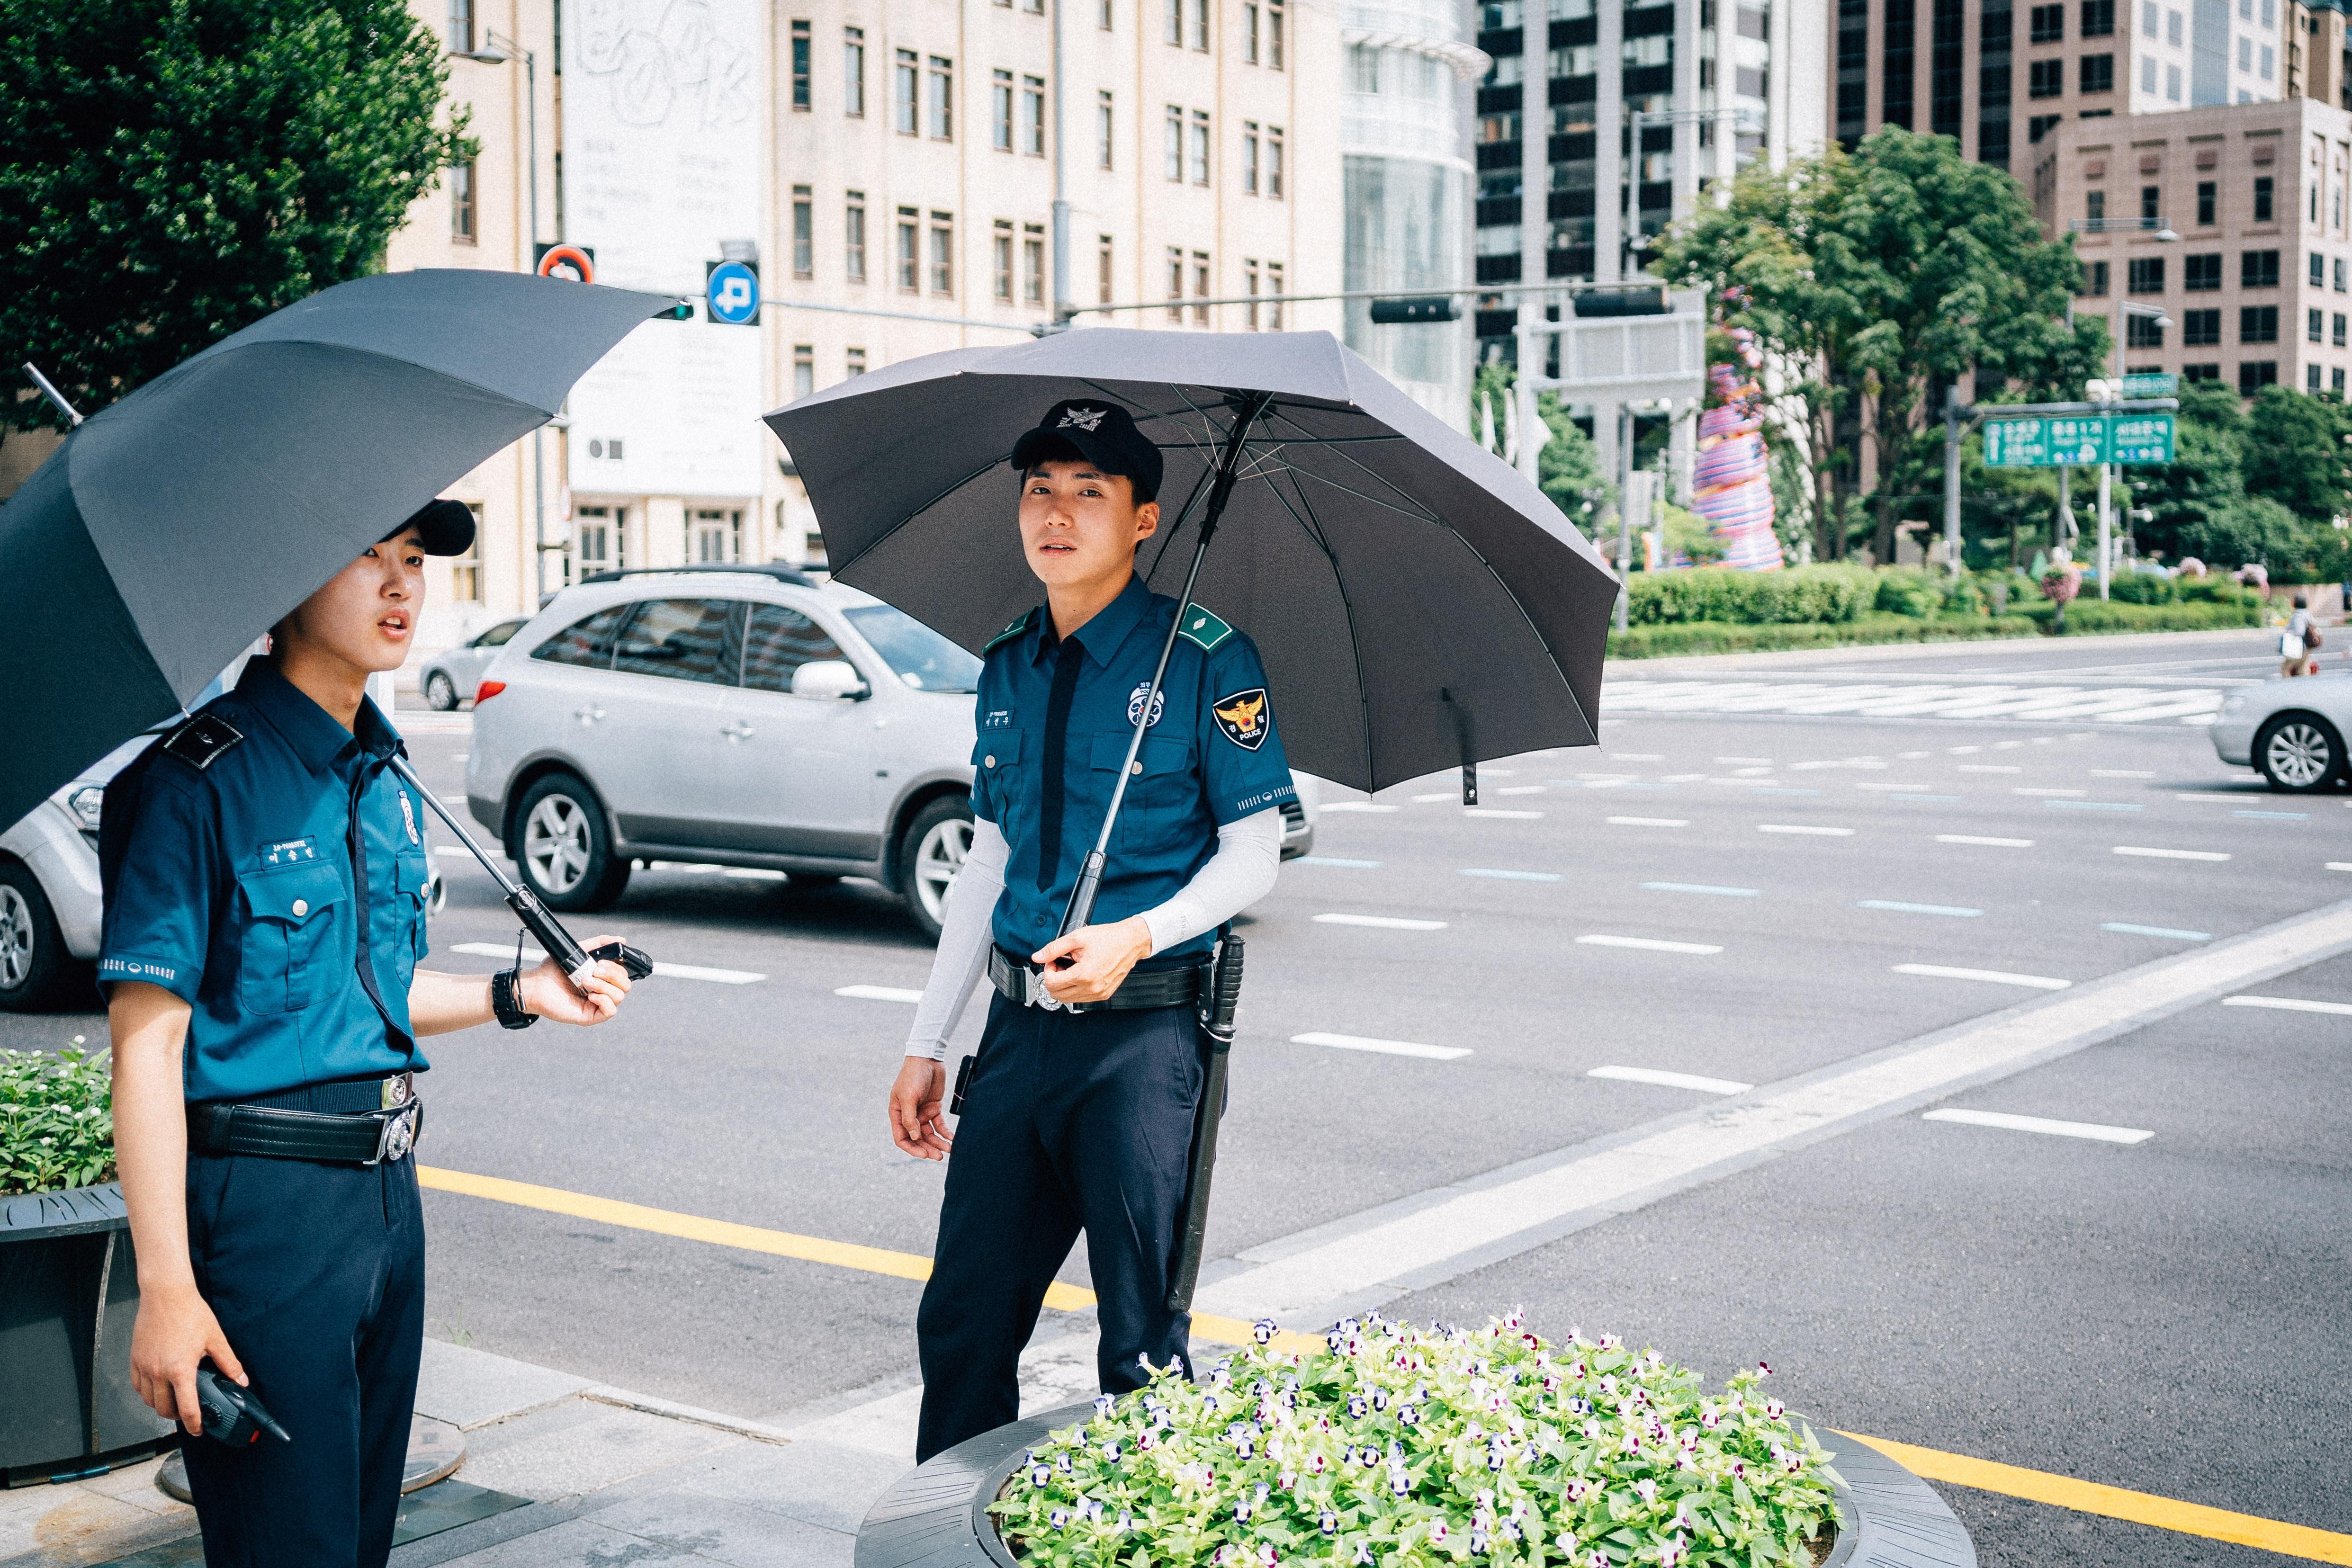 man under umbrella walking on street